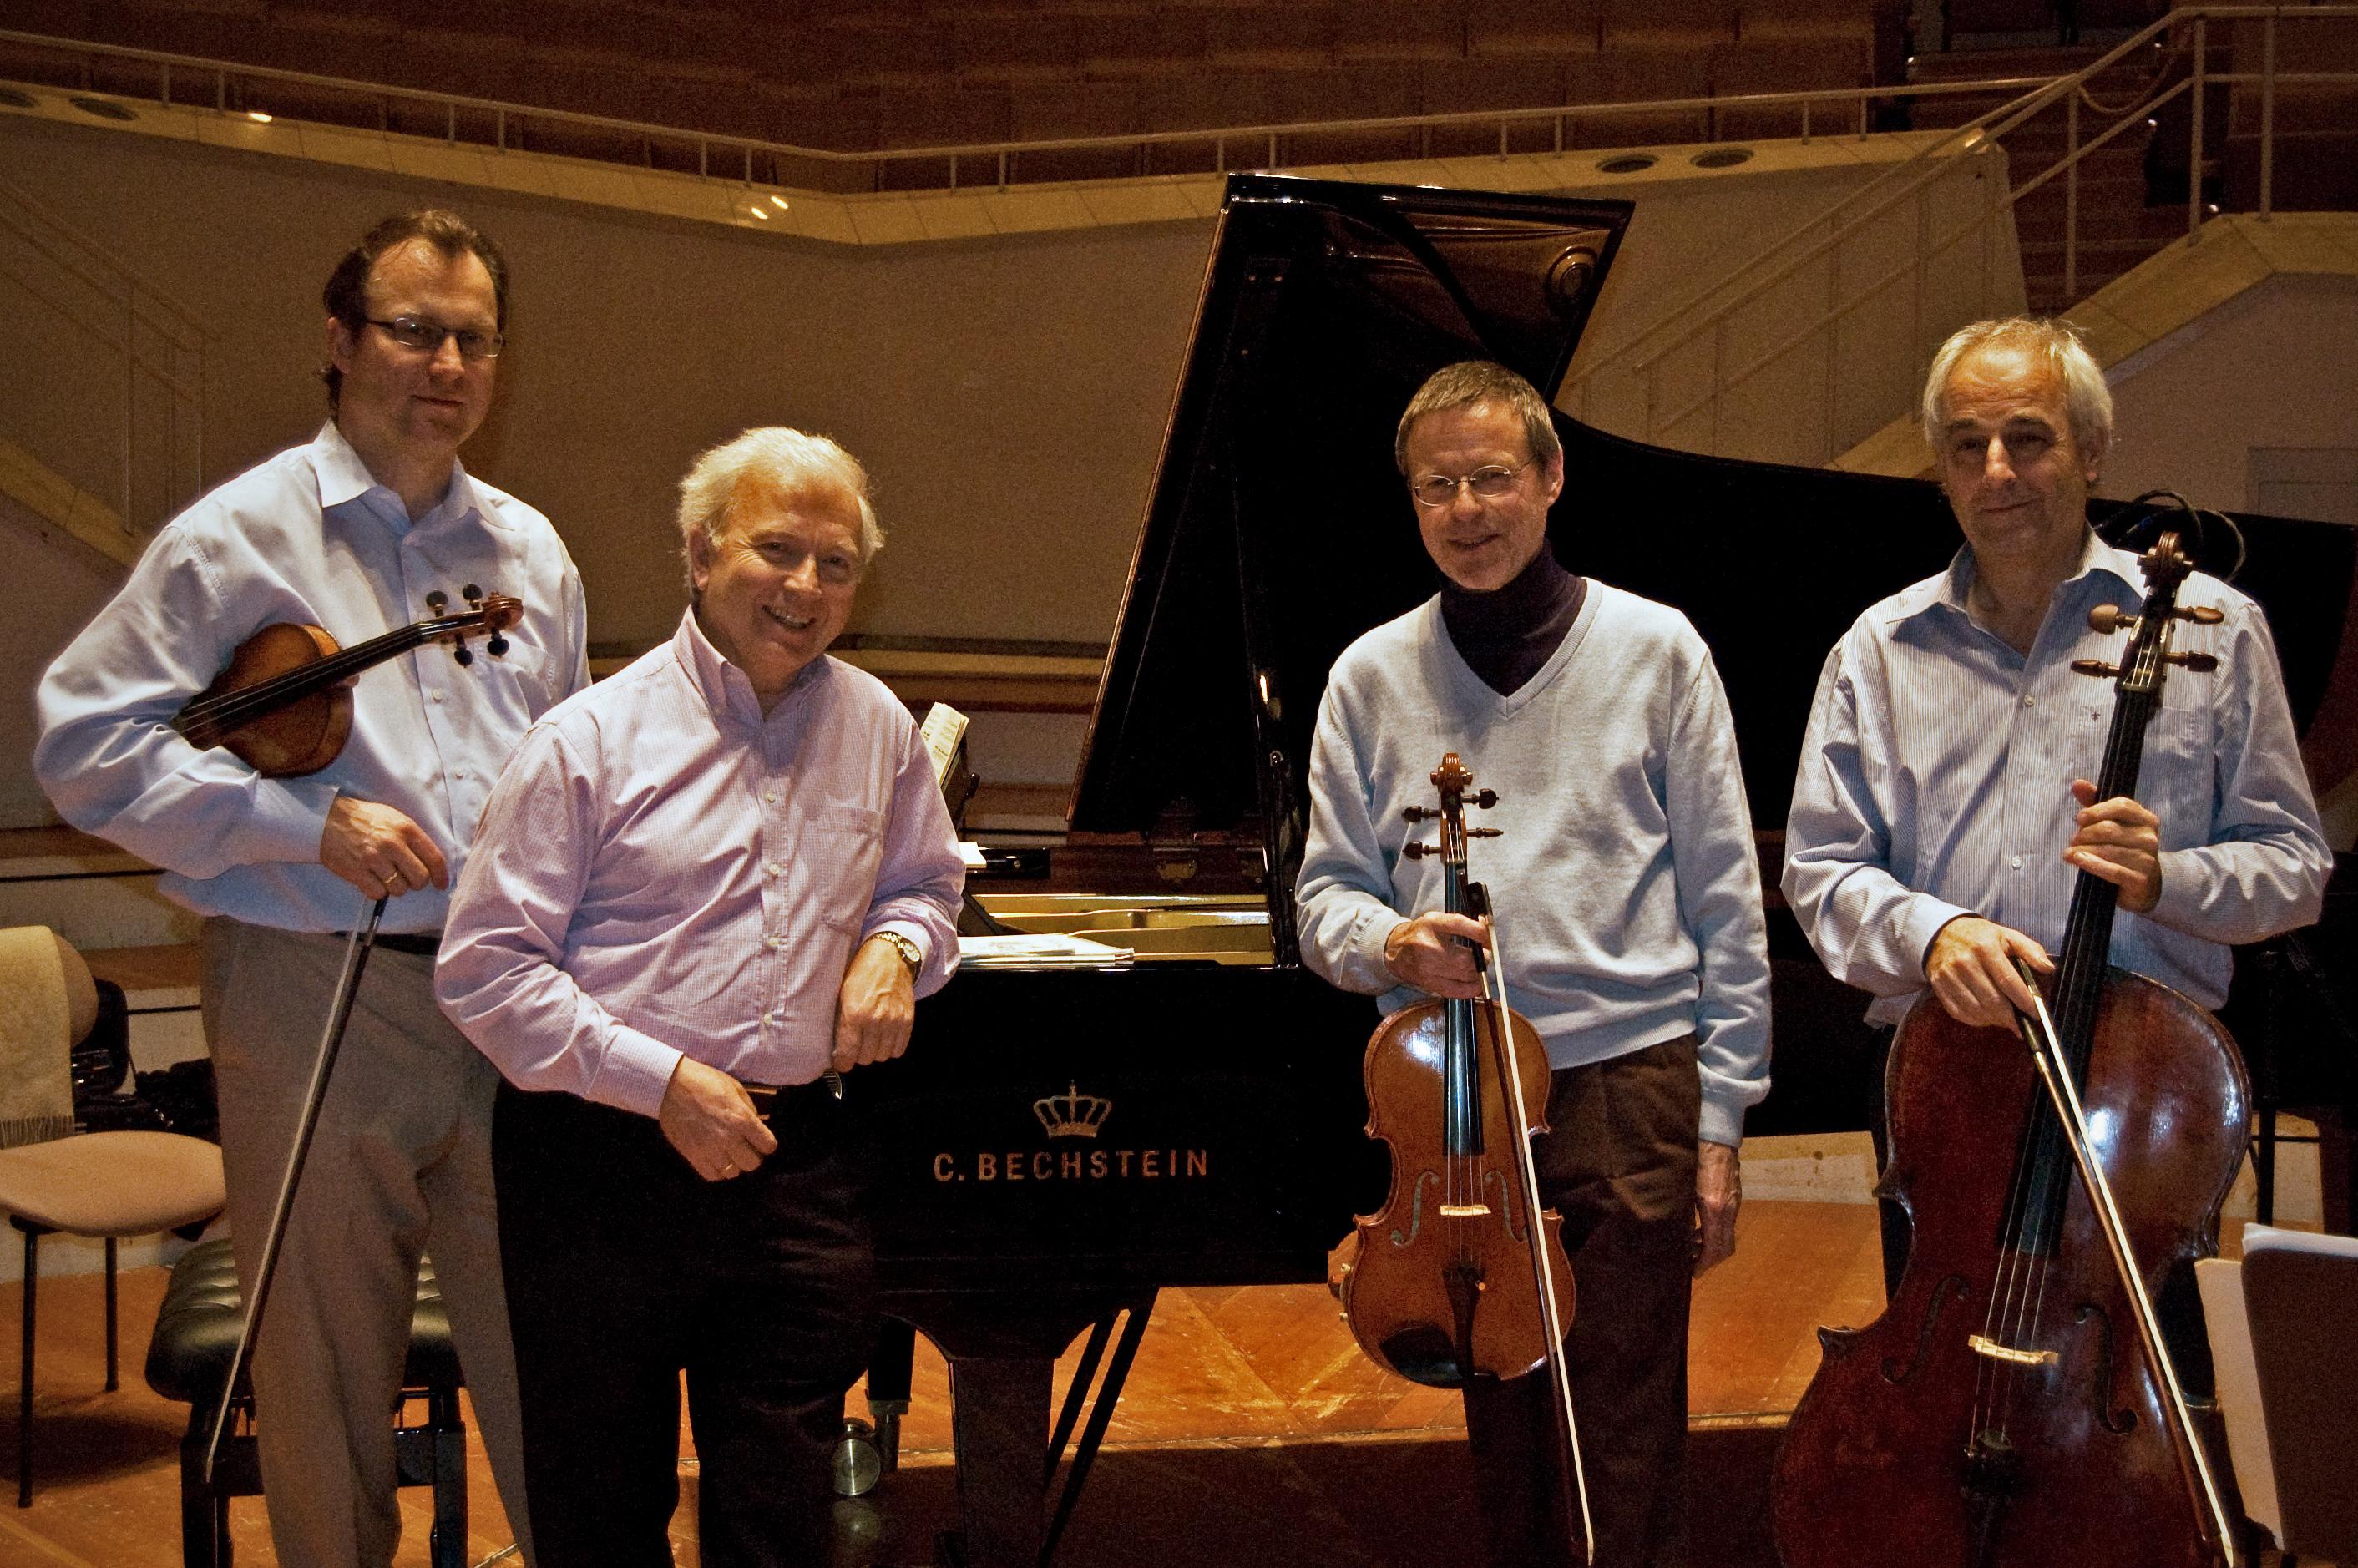 quartett+bechstein.jpg